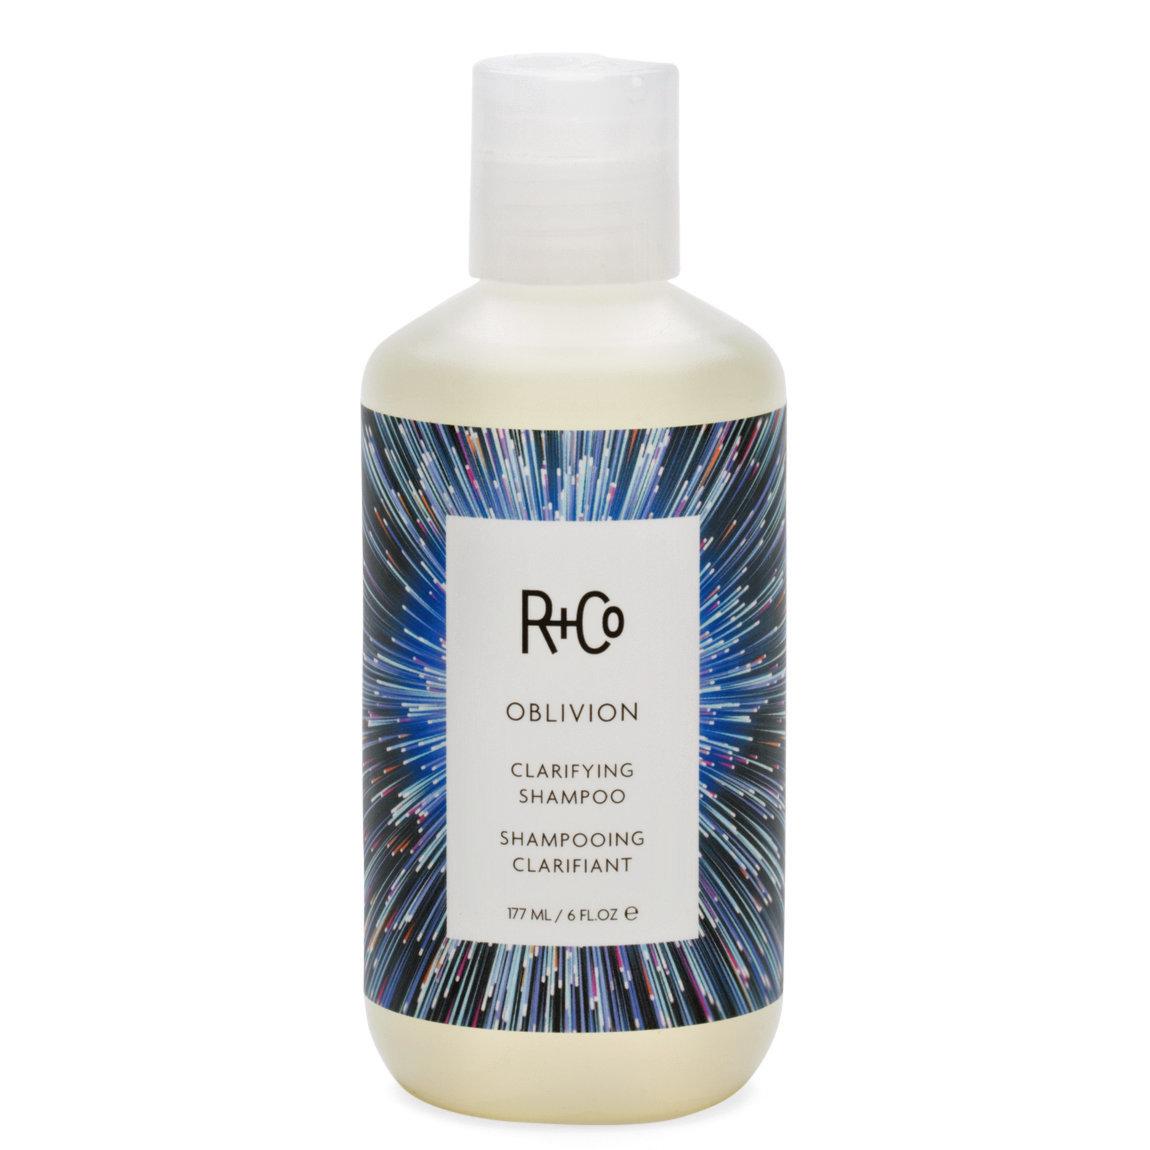 R+Co Oblivion Clarifying Shampoo product swatch.